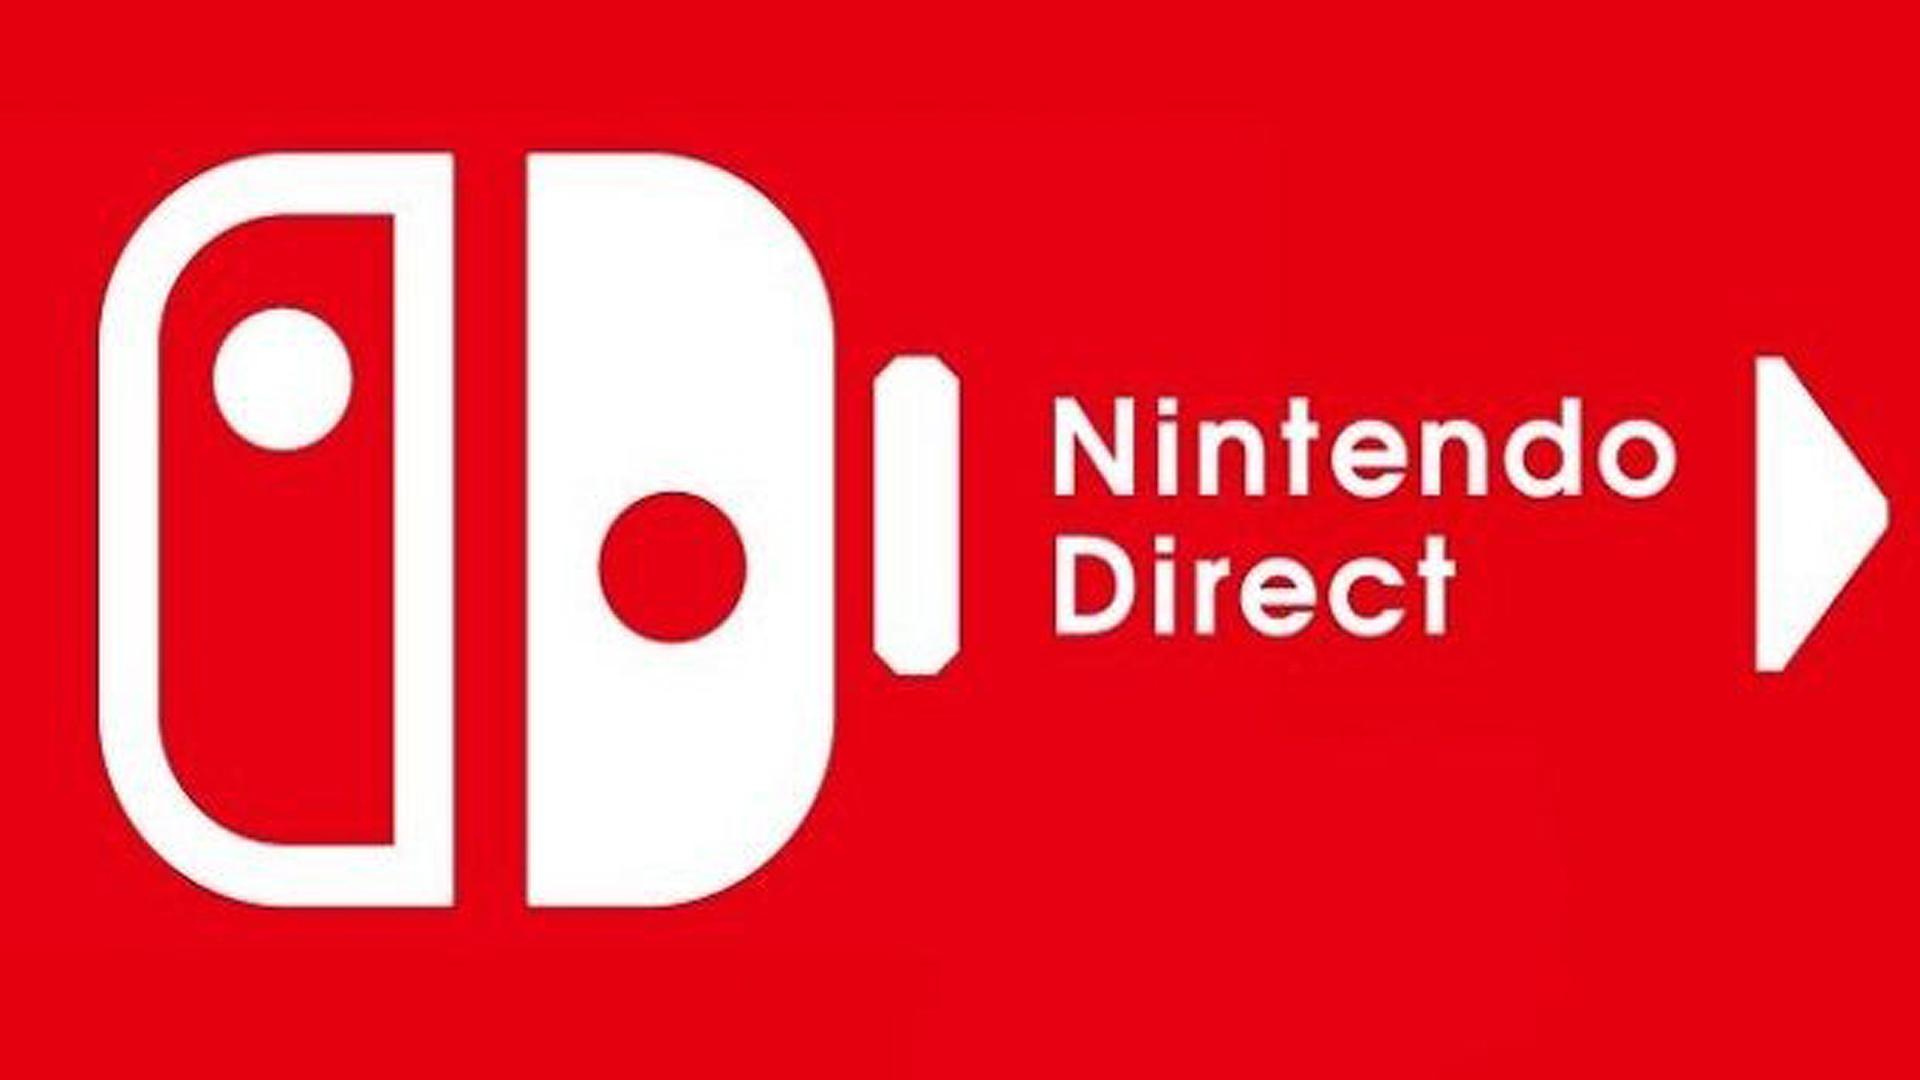 Neue Nintendo Direct am Mittwoch, Super Smash Bros. Ultimate im Fokus